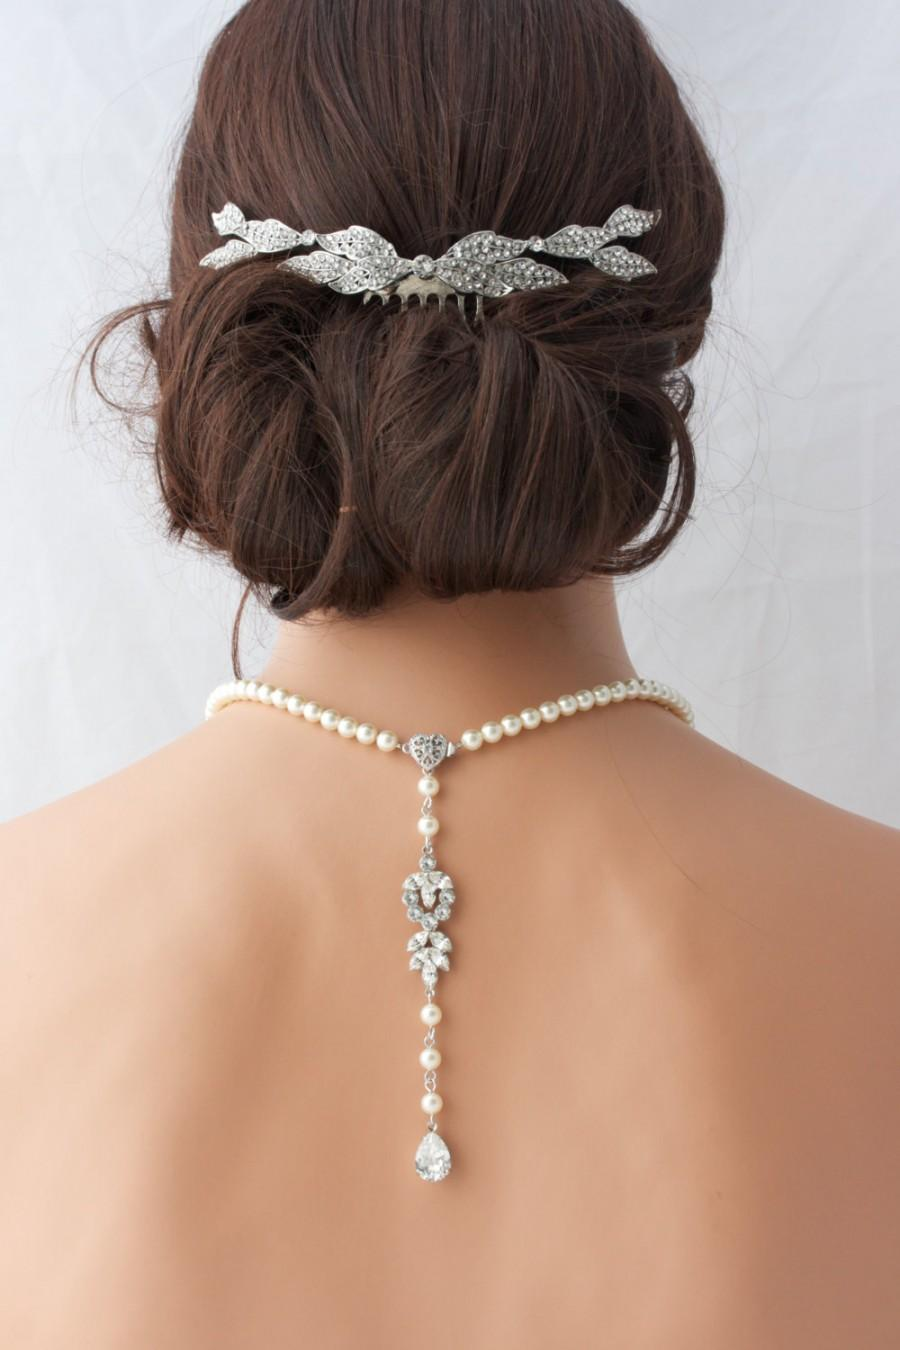 زفاف - Pearl Backdrop Bridal Necklace Crystal Pearl Wedding Necklace Simple Back Drop Swarovski Crystal Wedding Jewelry AMELIA